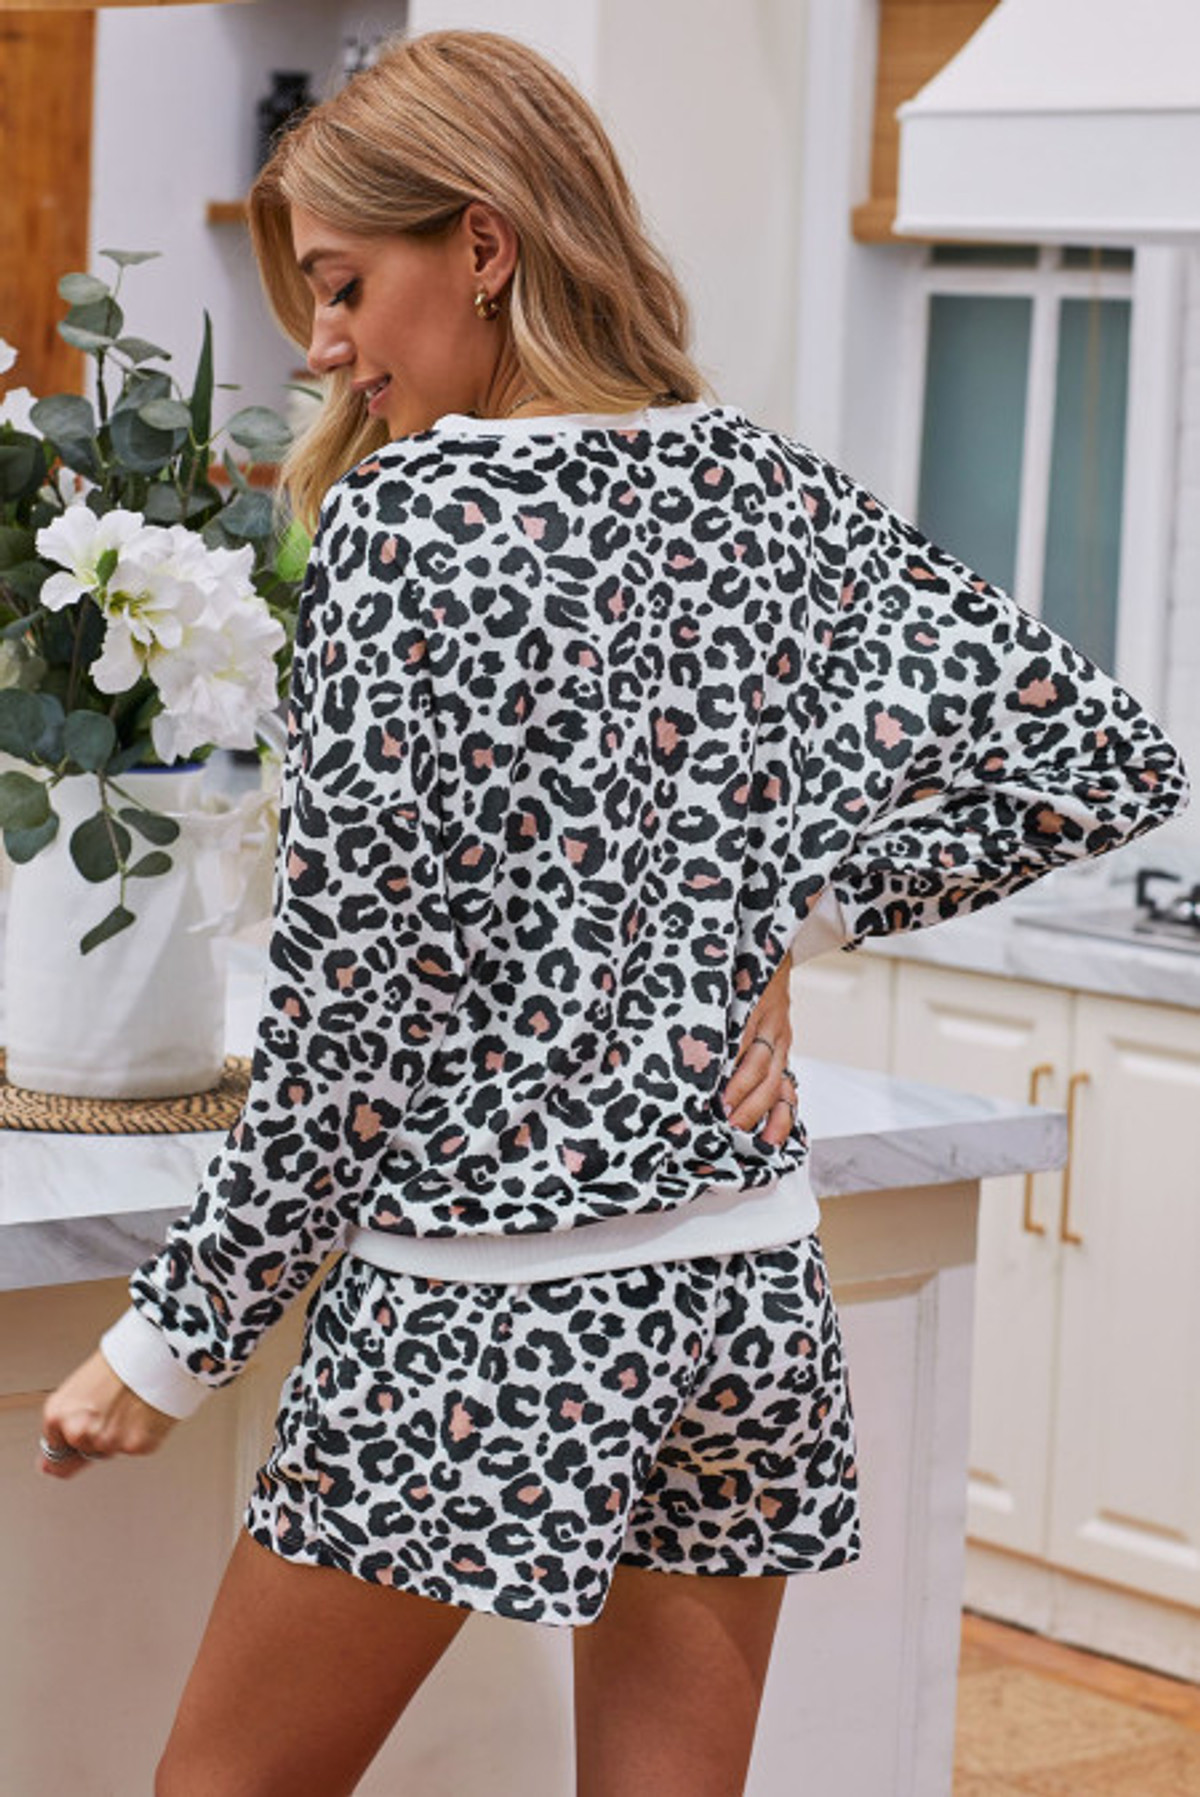 Leopard Long Sleeve & Shorts Pajamas Set (FRE45026-2)  FRE450262W2XL